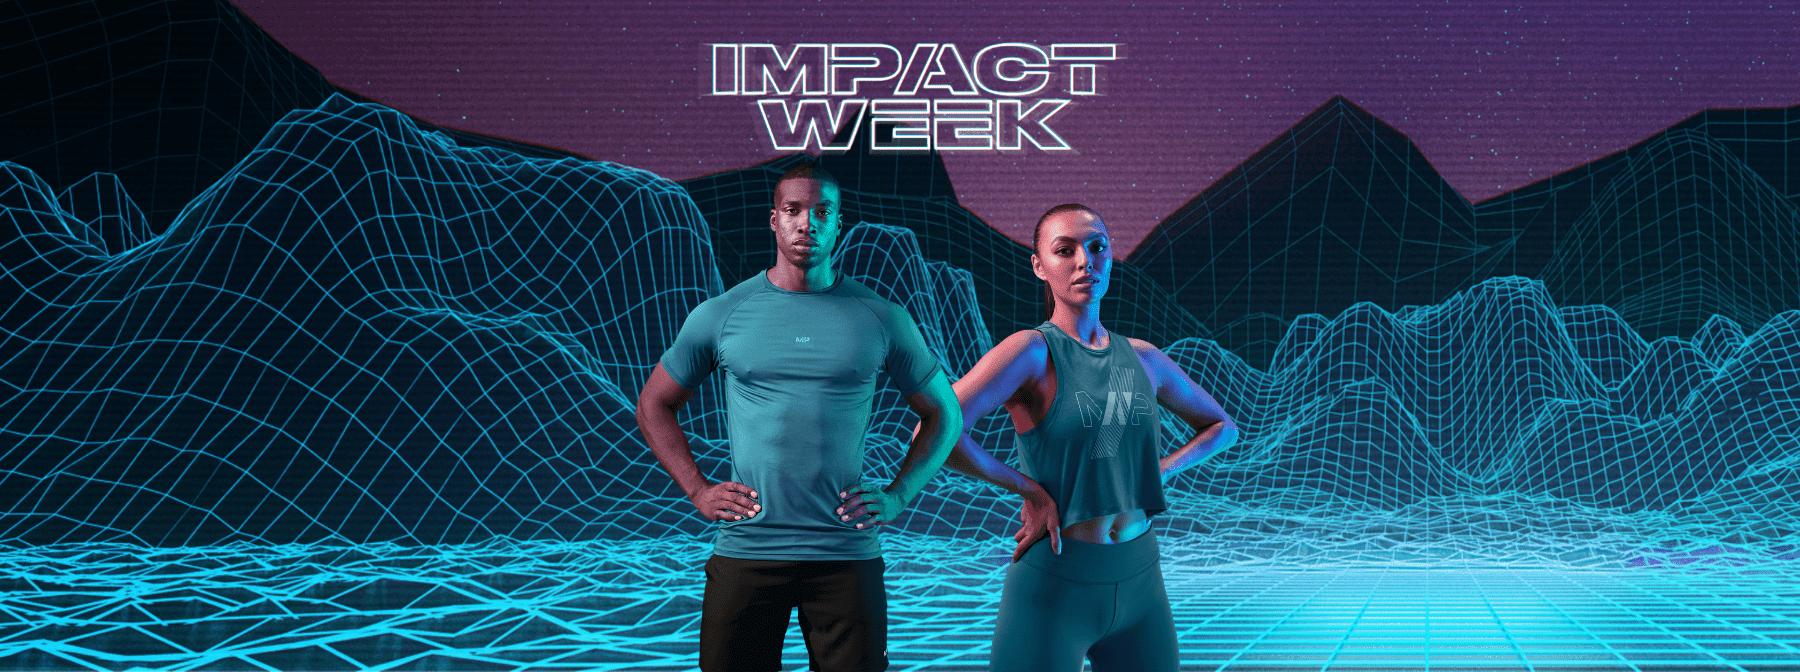 Impact Week | Capi di abbigliamento in edizione limitata